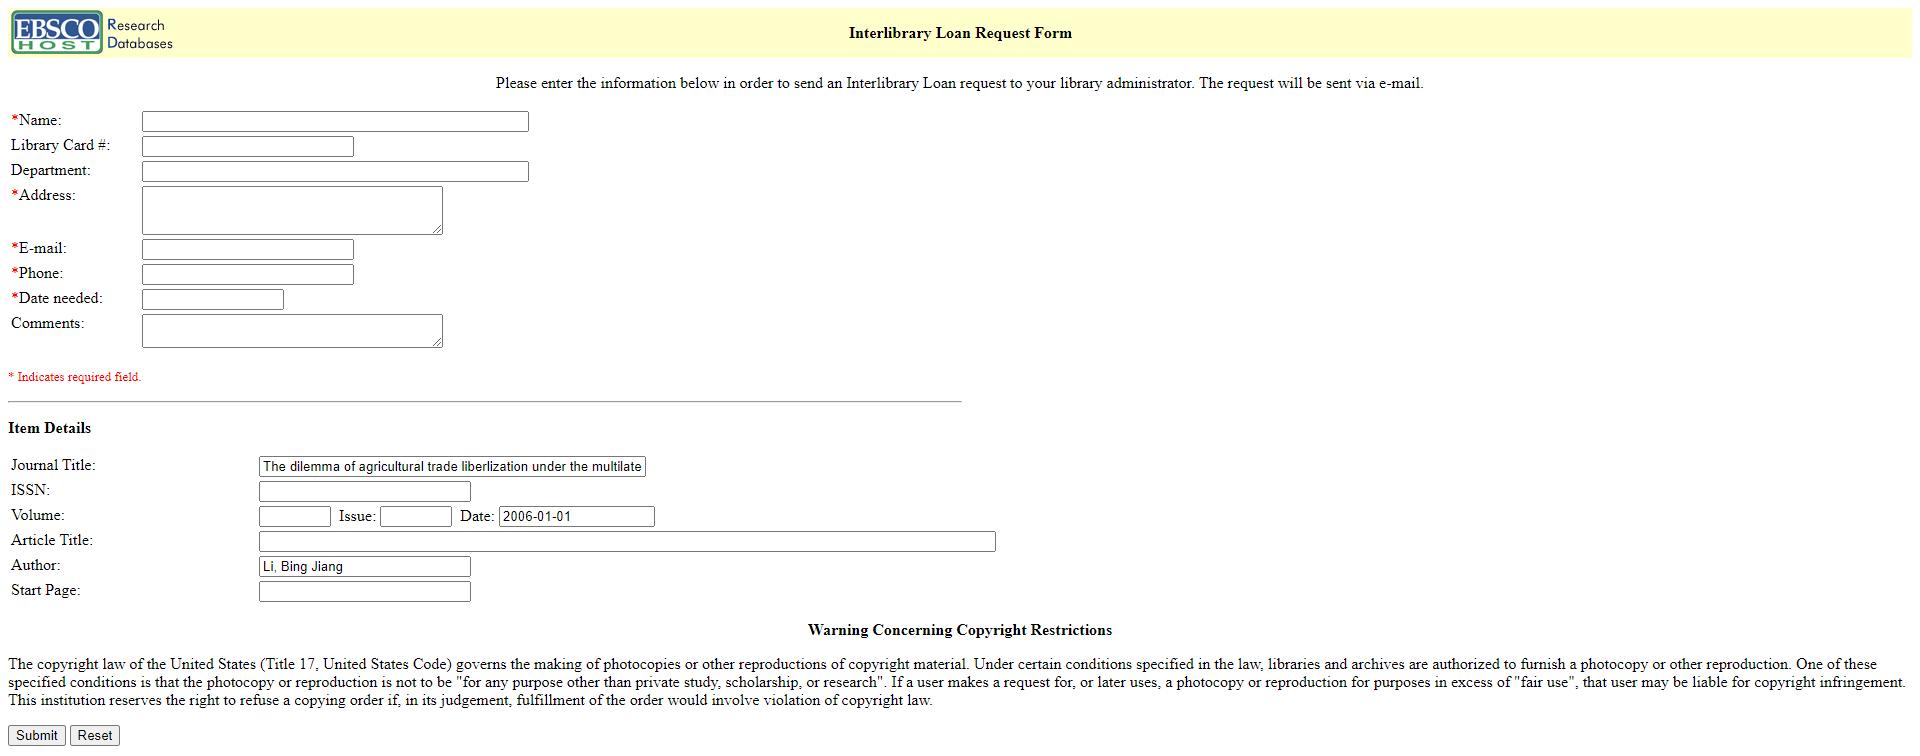 interlibrary loan online form